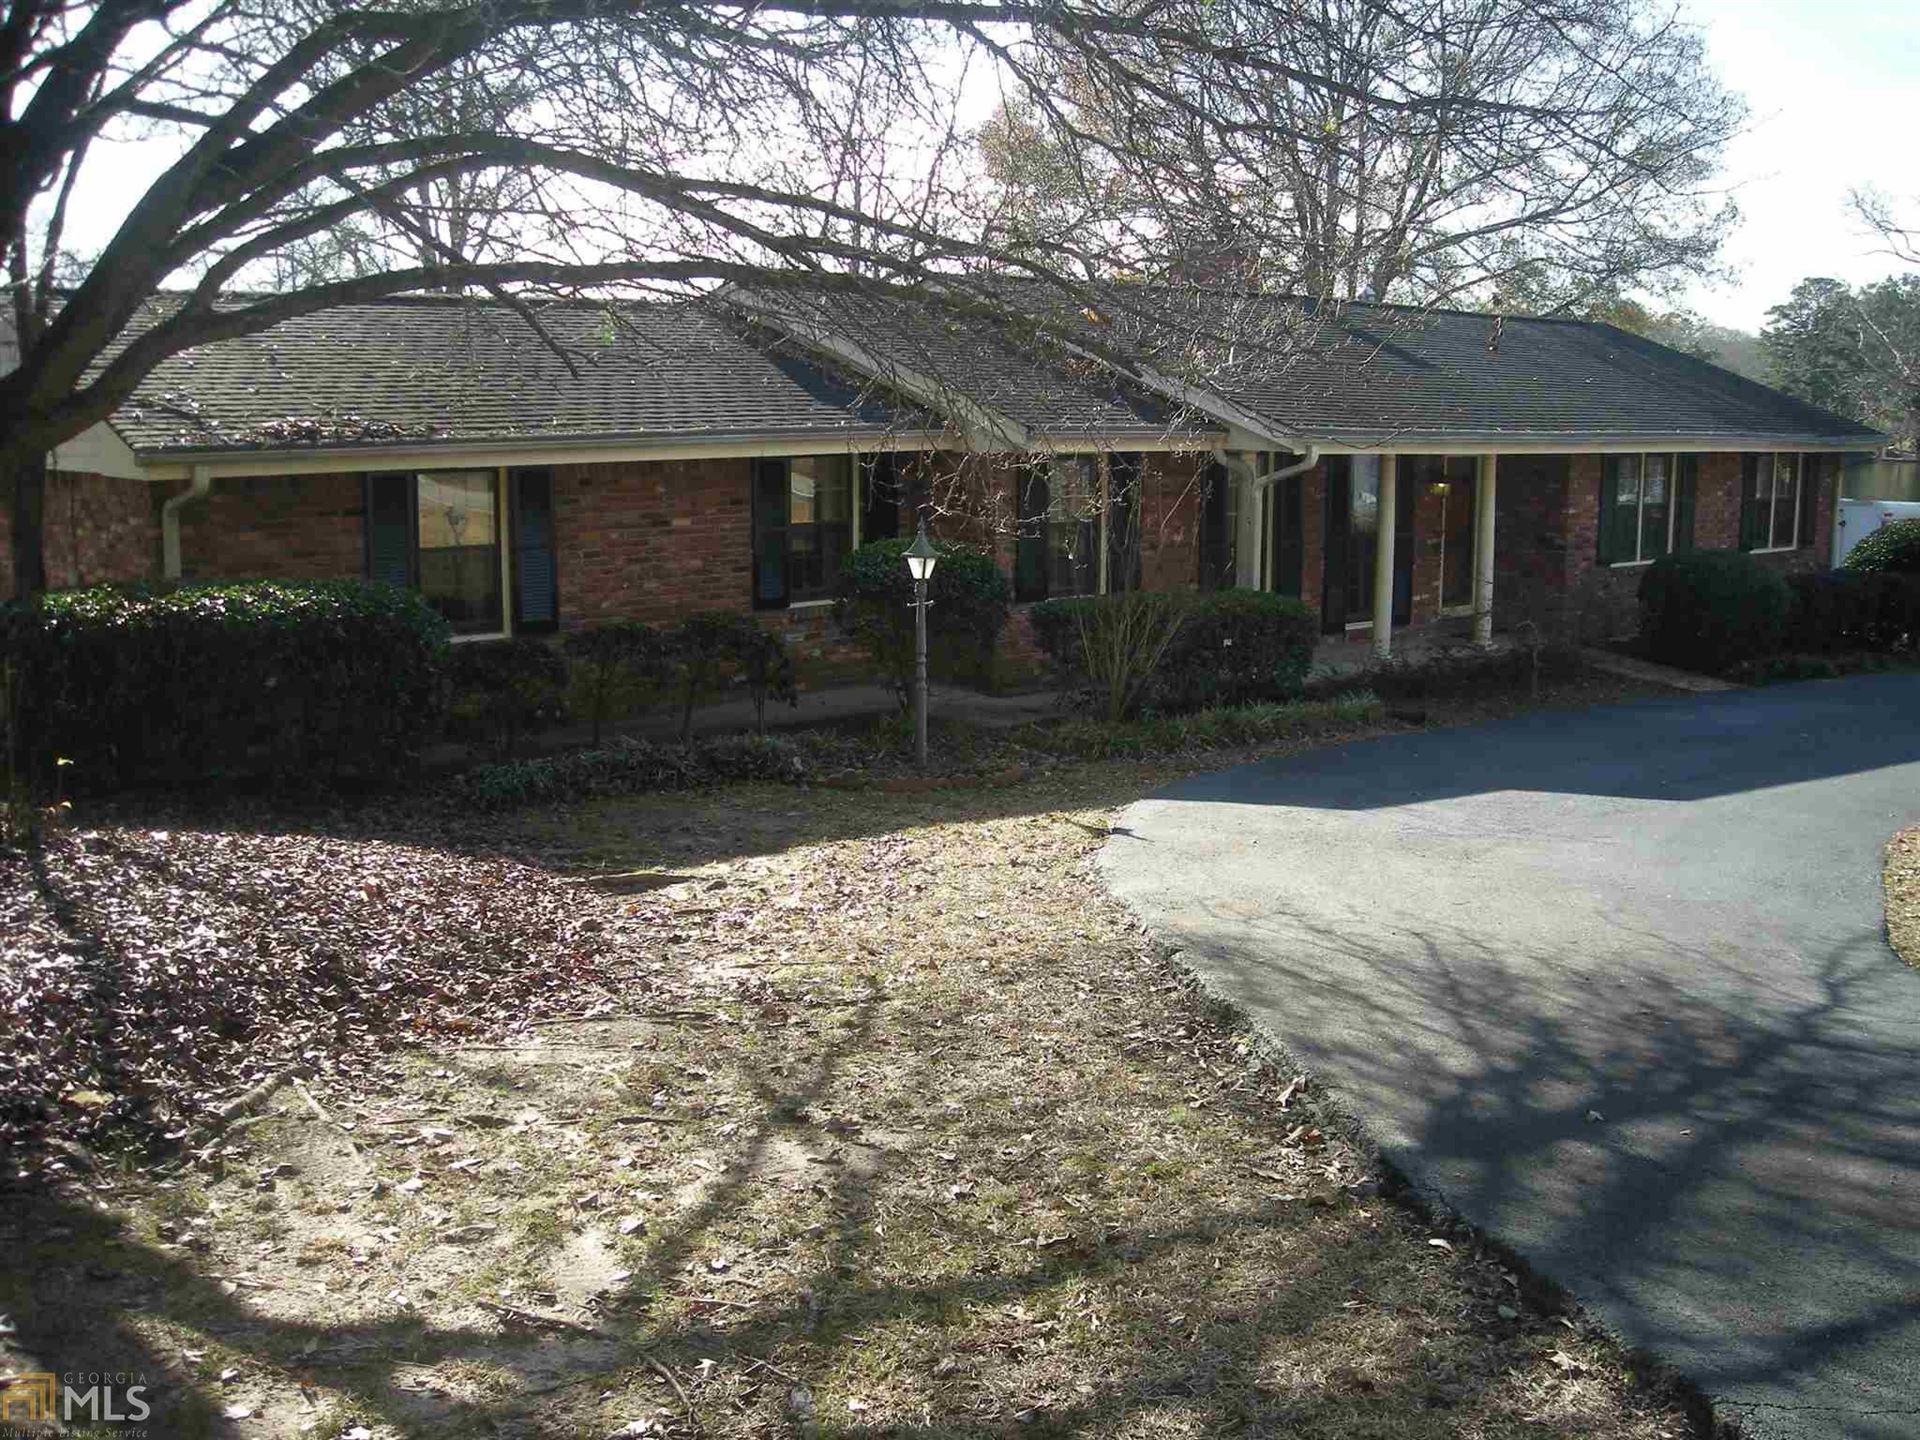 3217 Lake Jodeco Rd, Jonesboro, GA 30236 - MLS#: 8908260